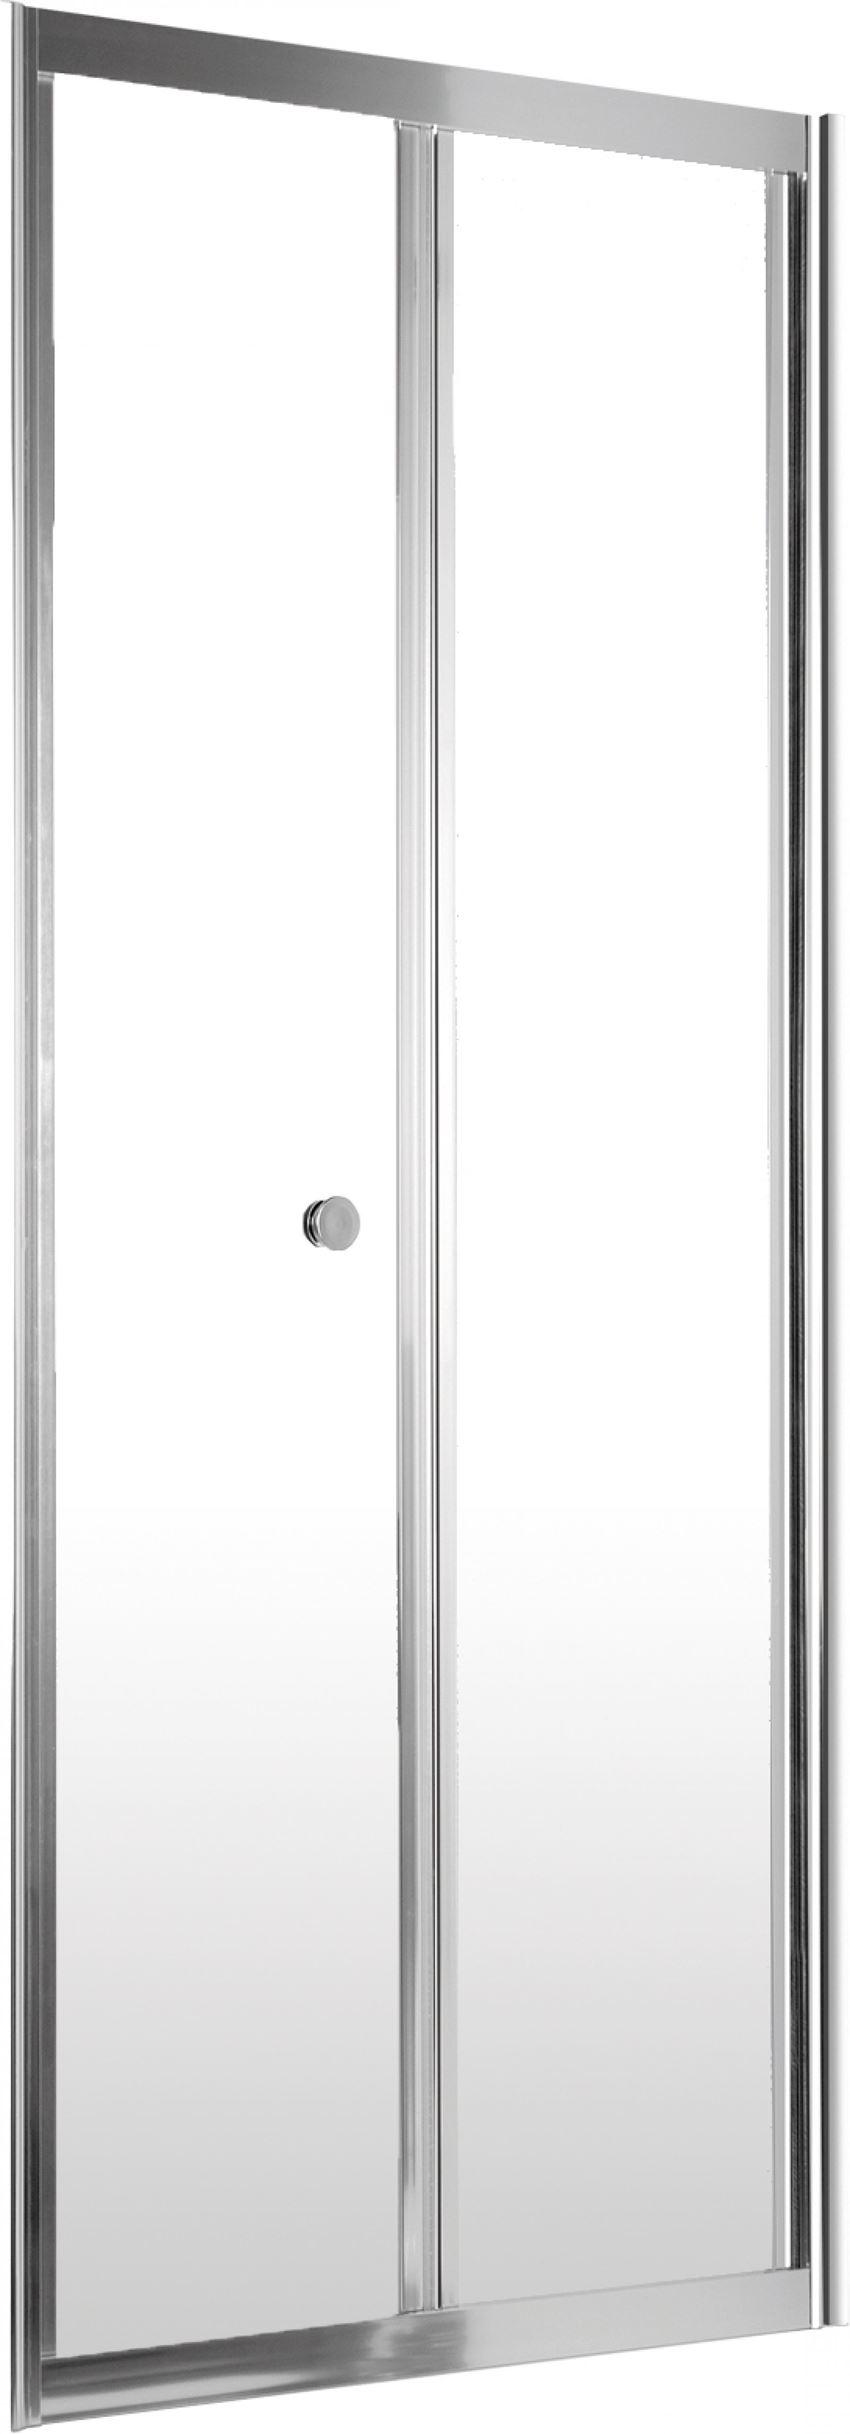 Drzwi wnękowe Deante Flex KTL 021D